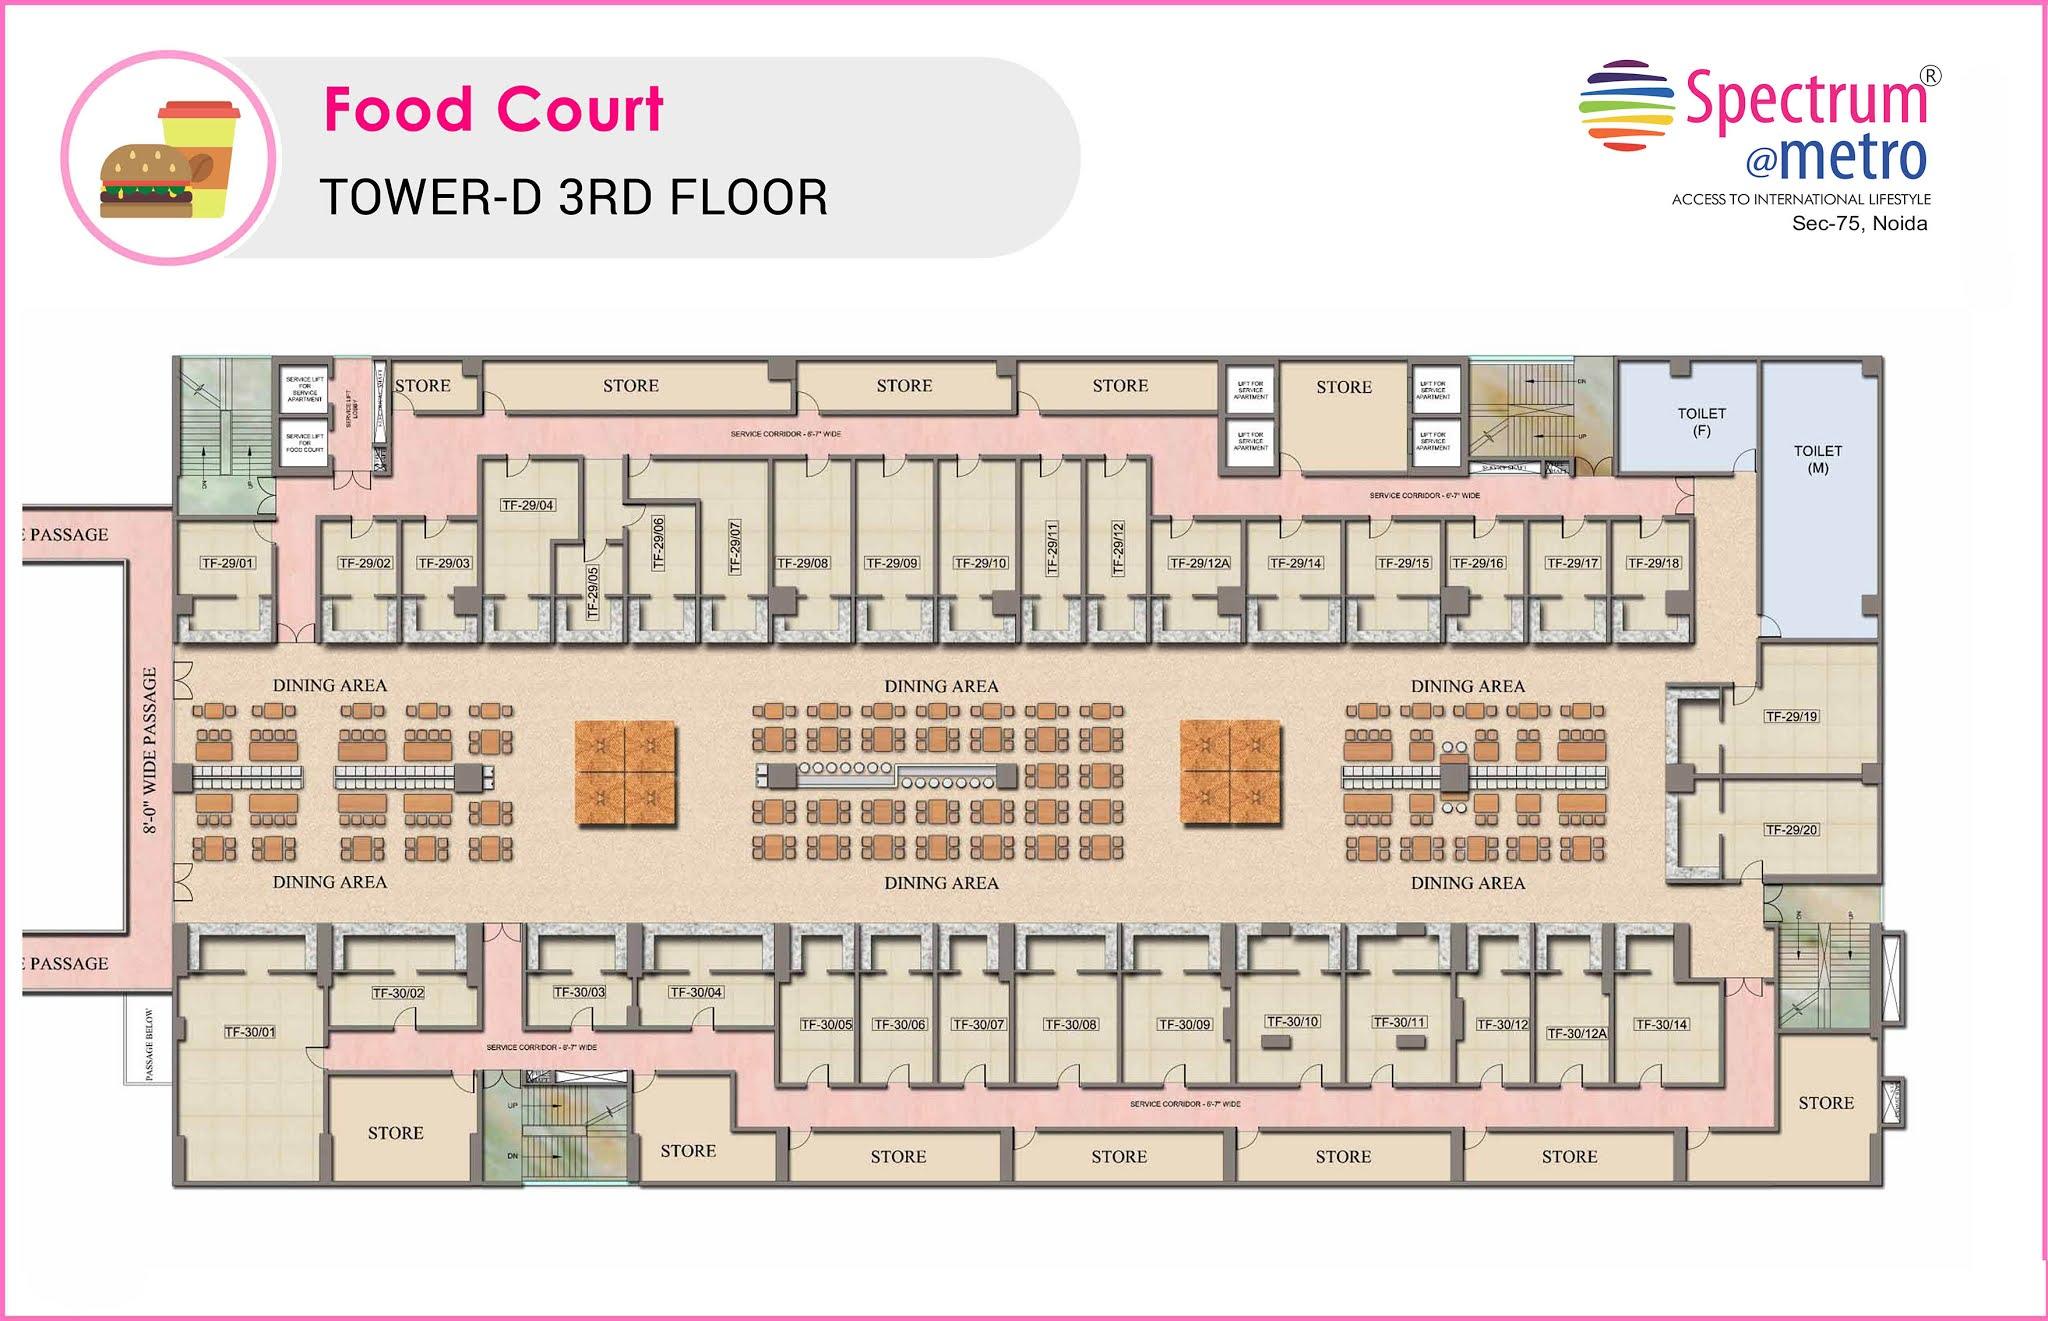 spectrum-metro-food-court